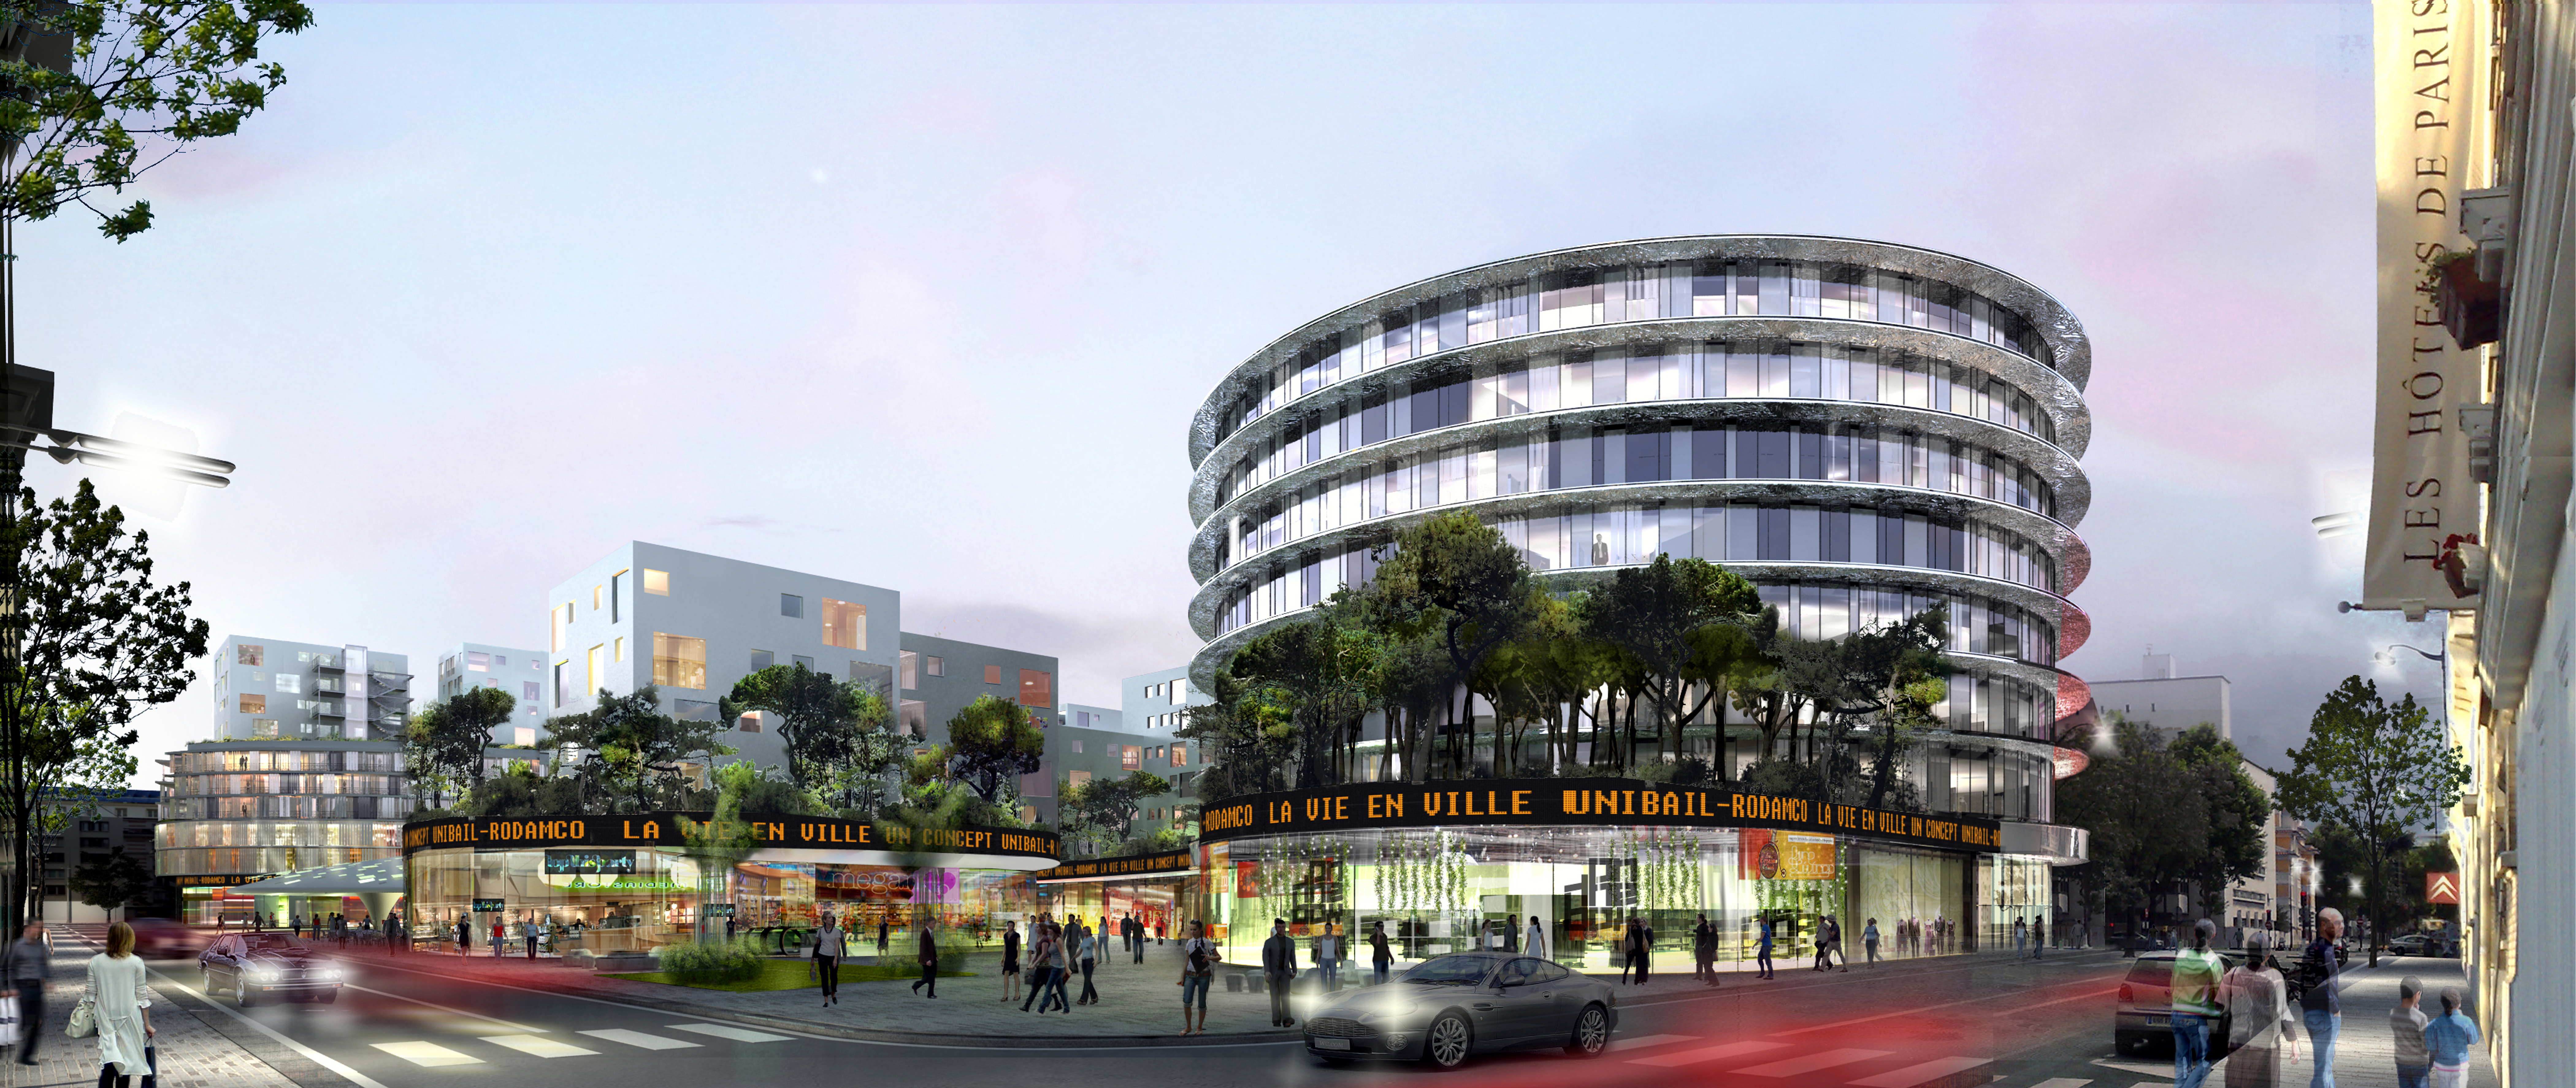 INTERSENS - PCA Architecture - Unibail - Rodamco - Etude - La vie en ville.